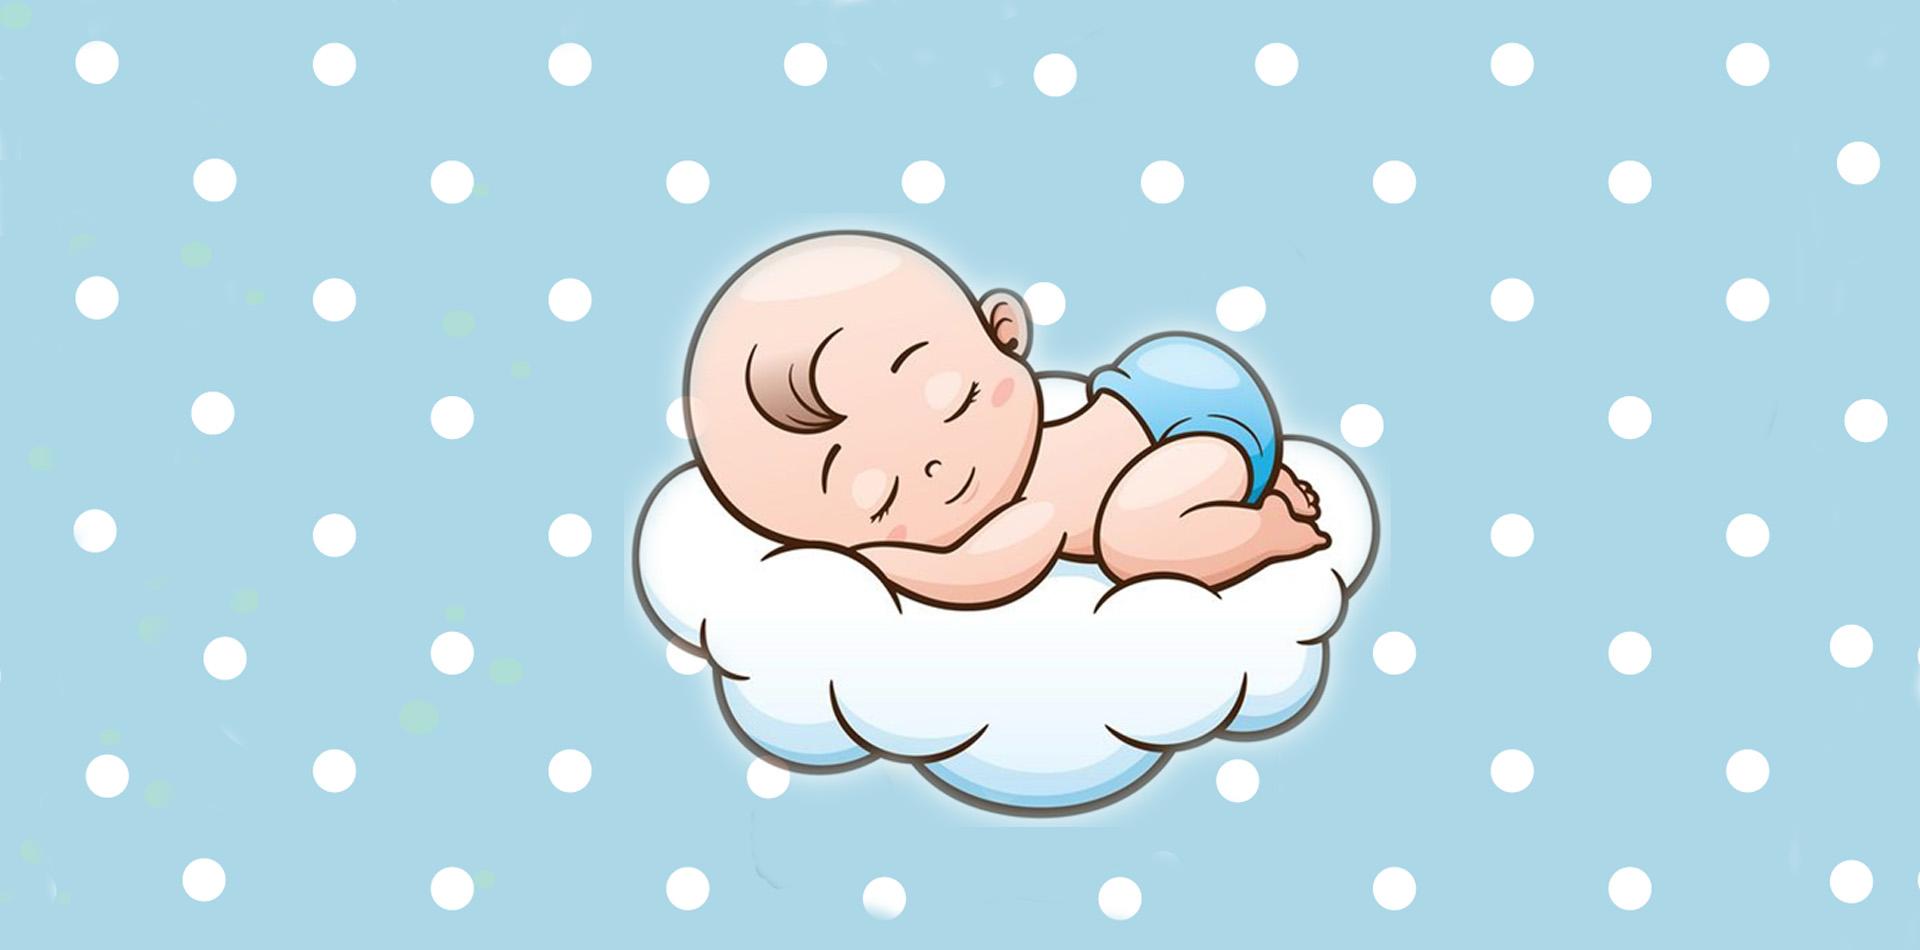 CONCERT FOR BABIES